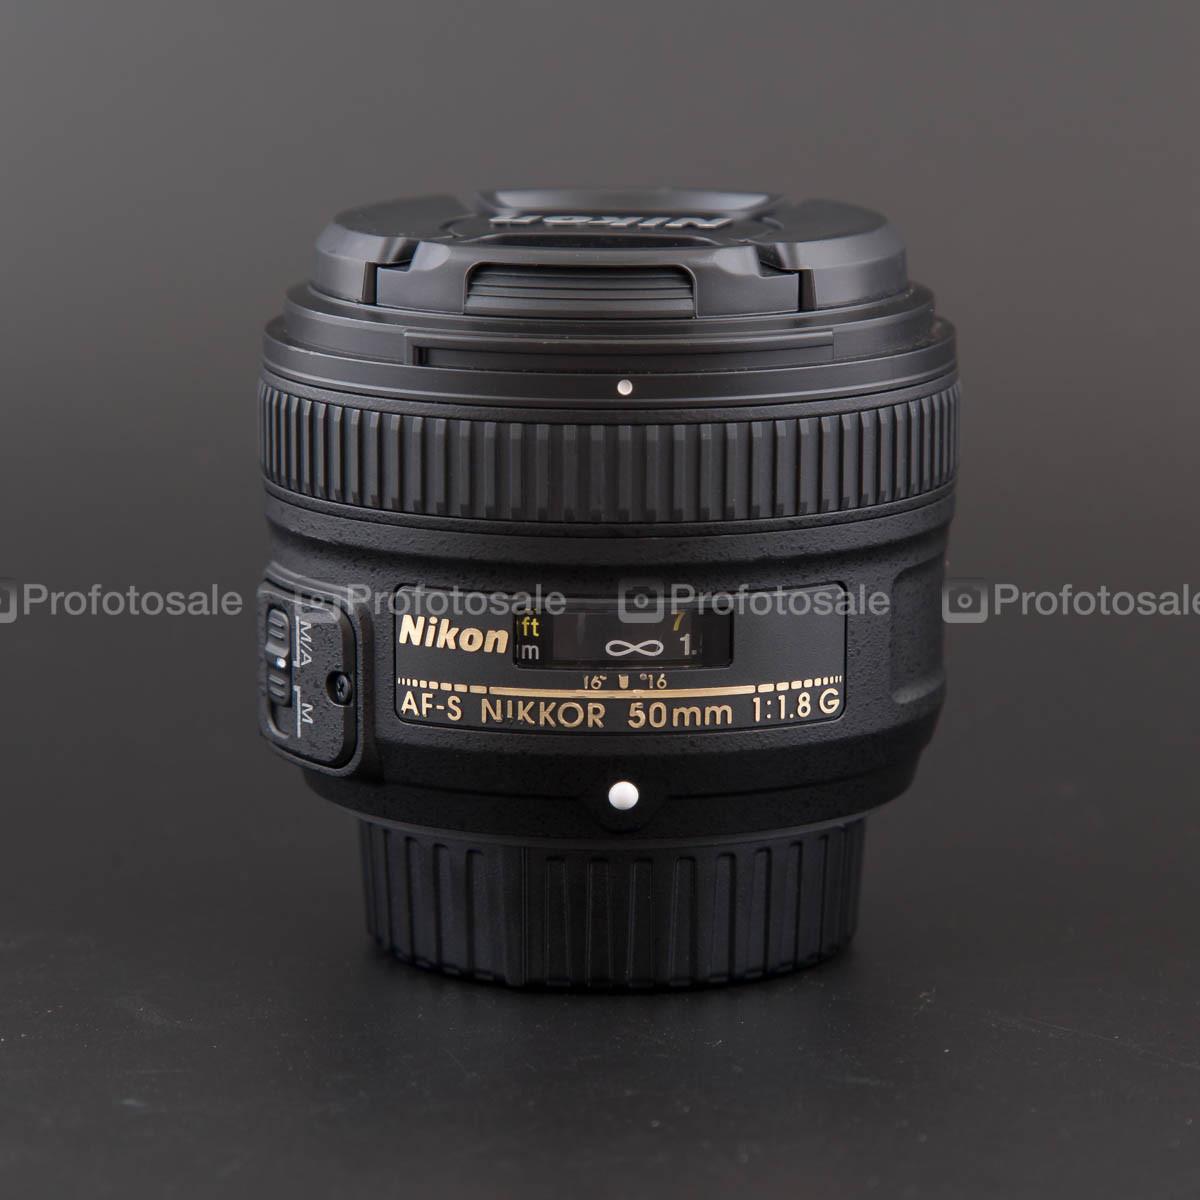 Nikon 50mm 1:1.8G